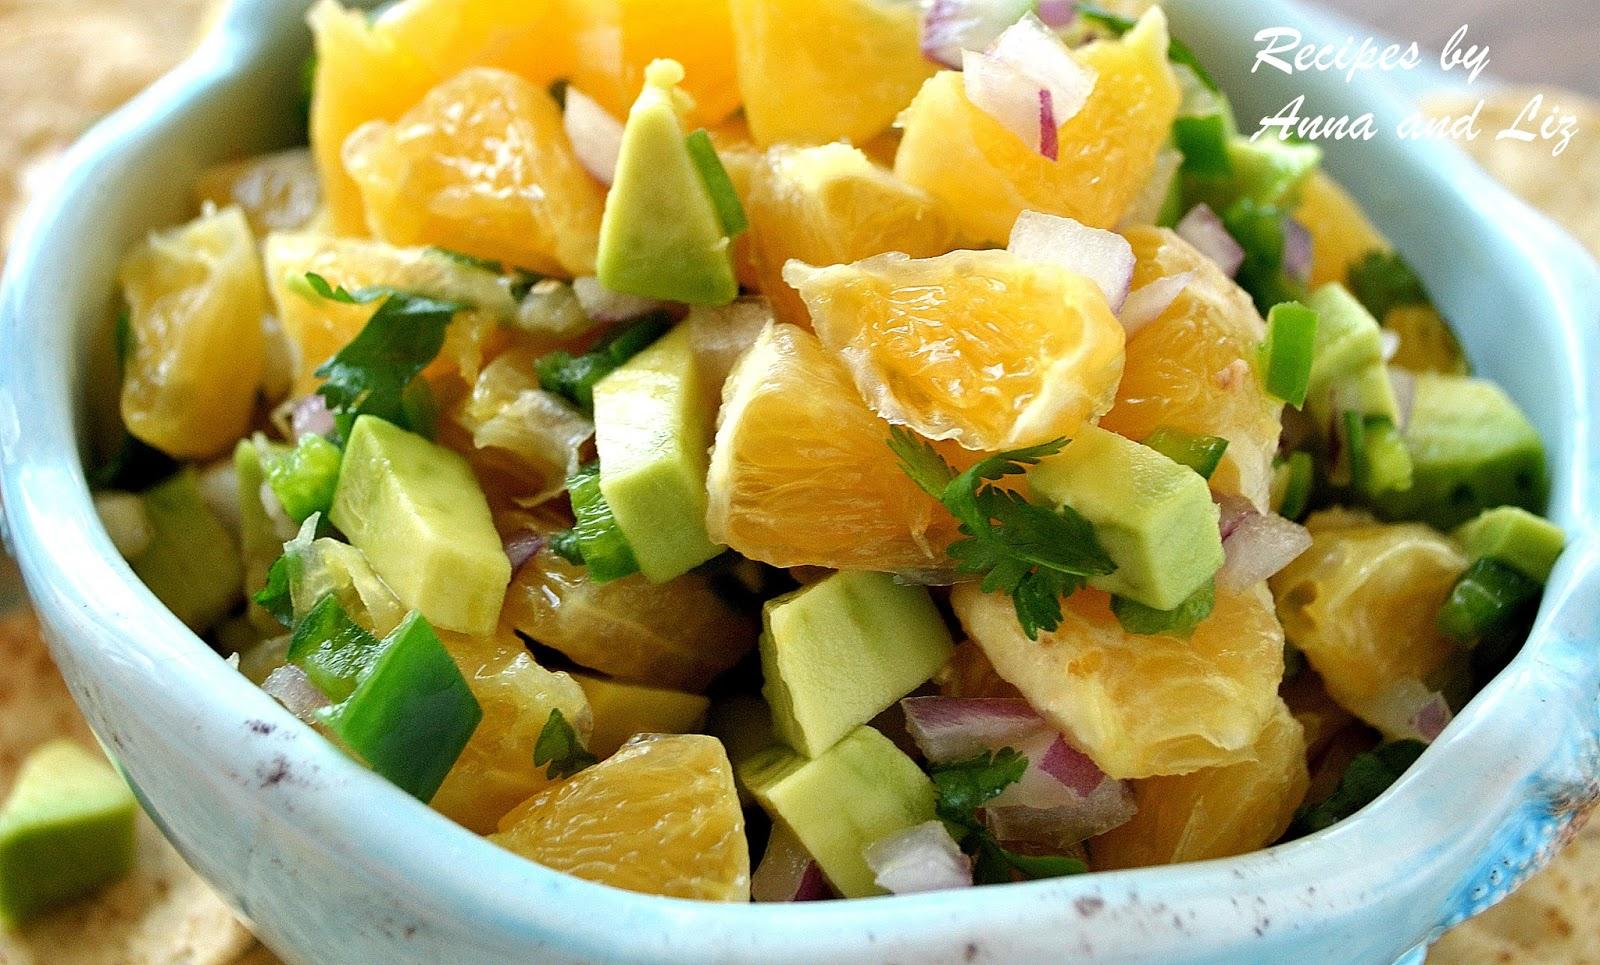 Fresh Orange Avocado Salsa - 2 Sisters Recipes by Anna and Liz